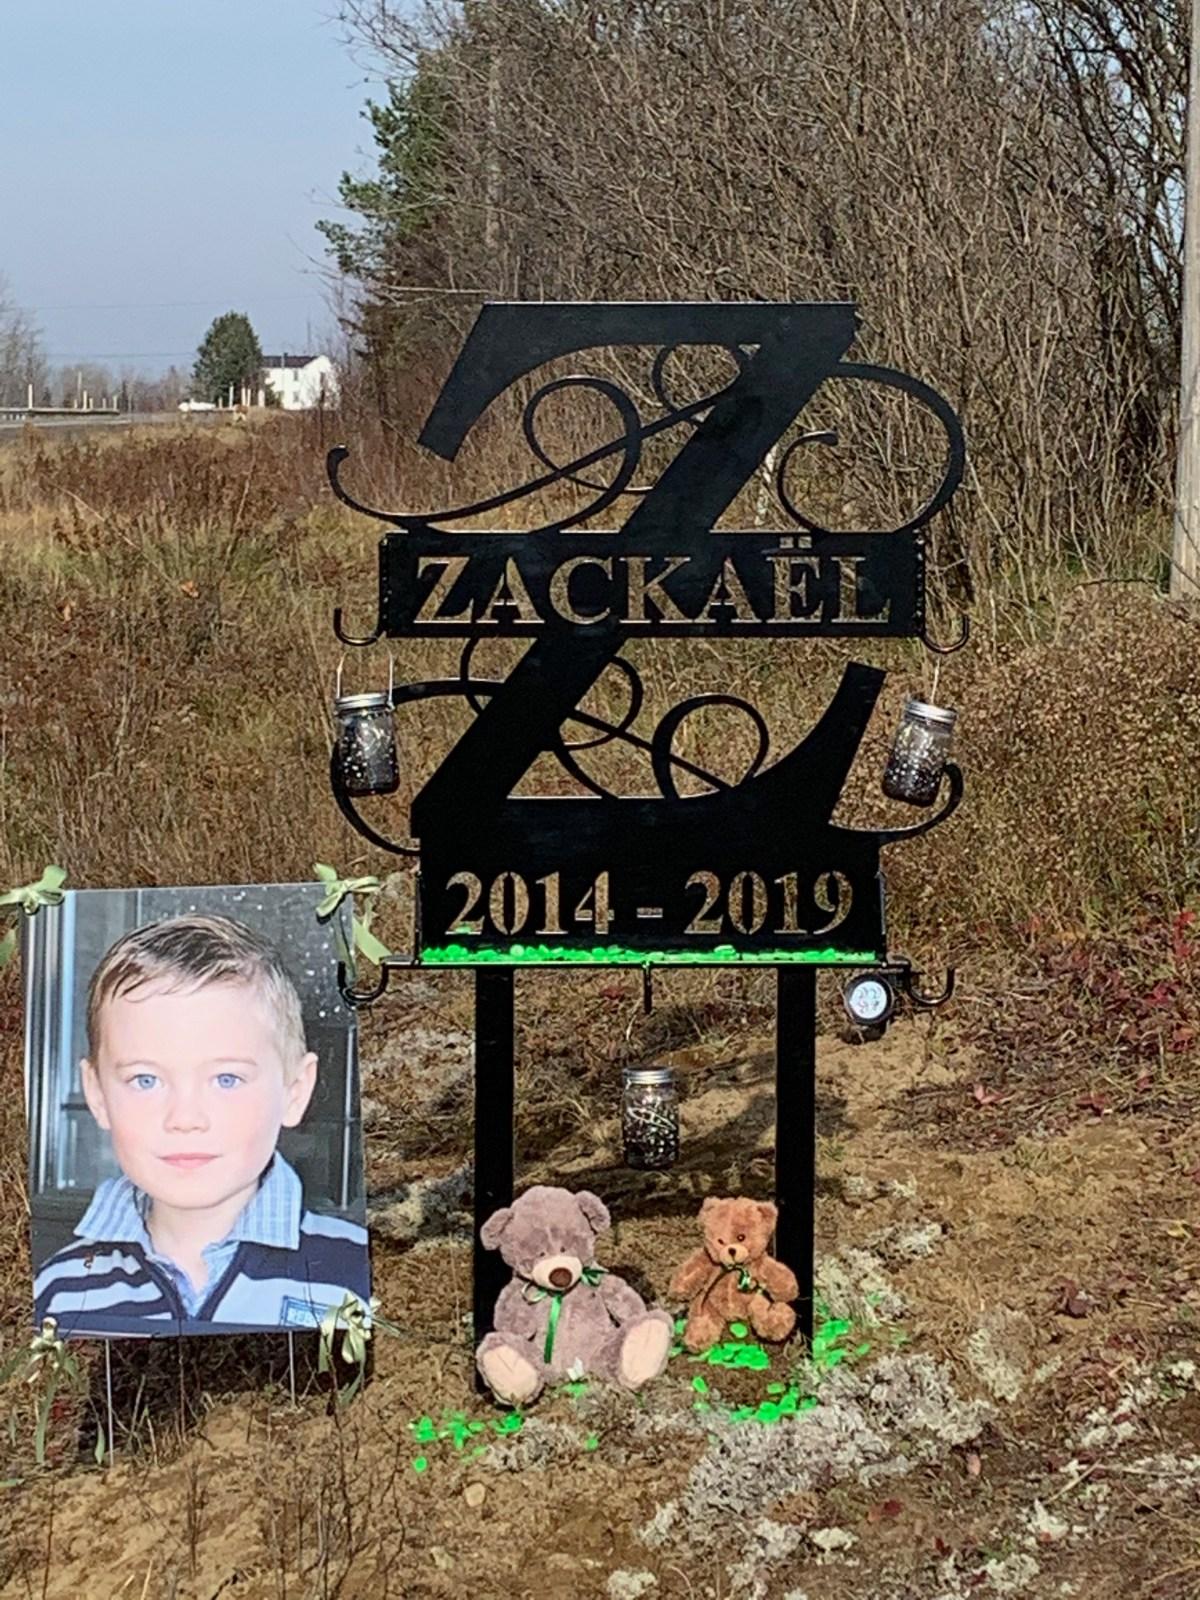 Zackaël monument route 323 Roadside Memorial de la route 323 accident